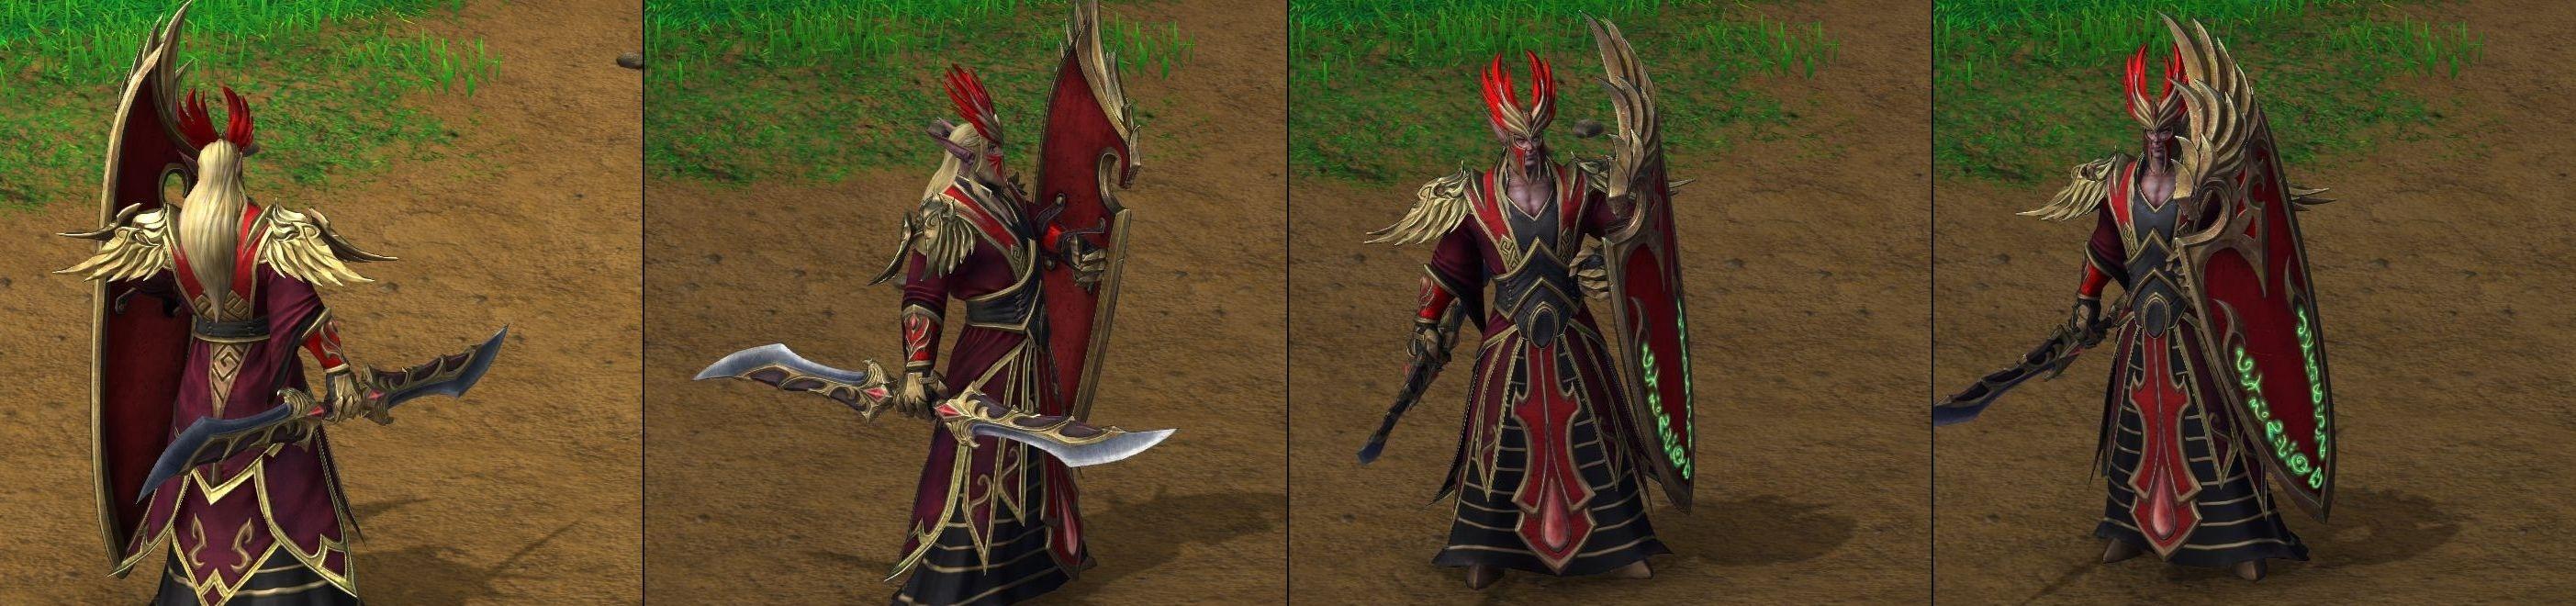 Warcraft 3 Reforged Spell Breaker